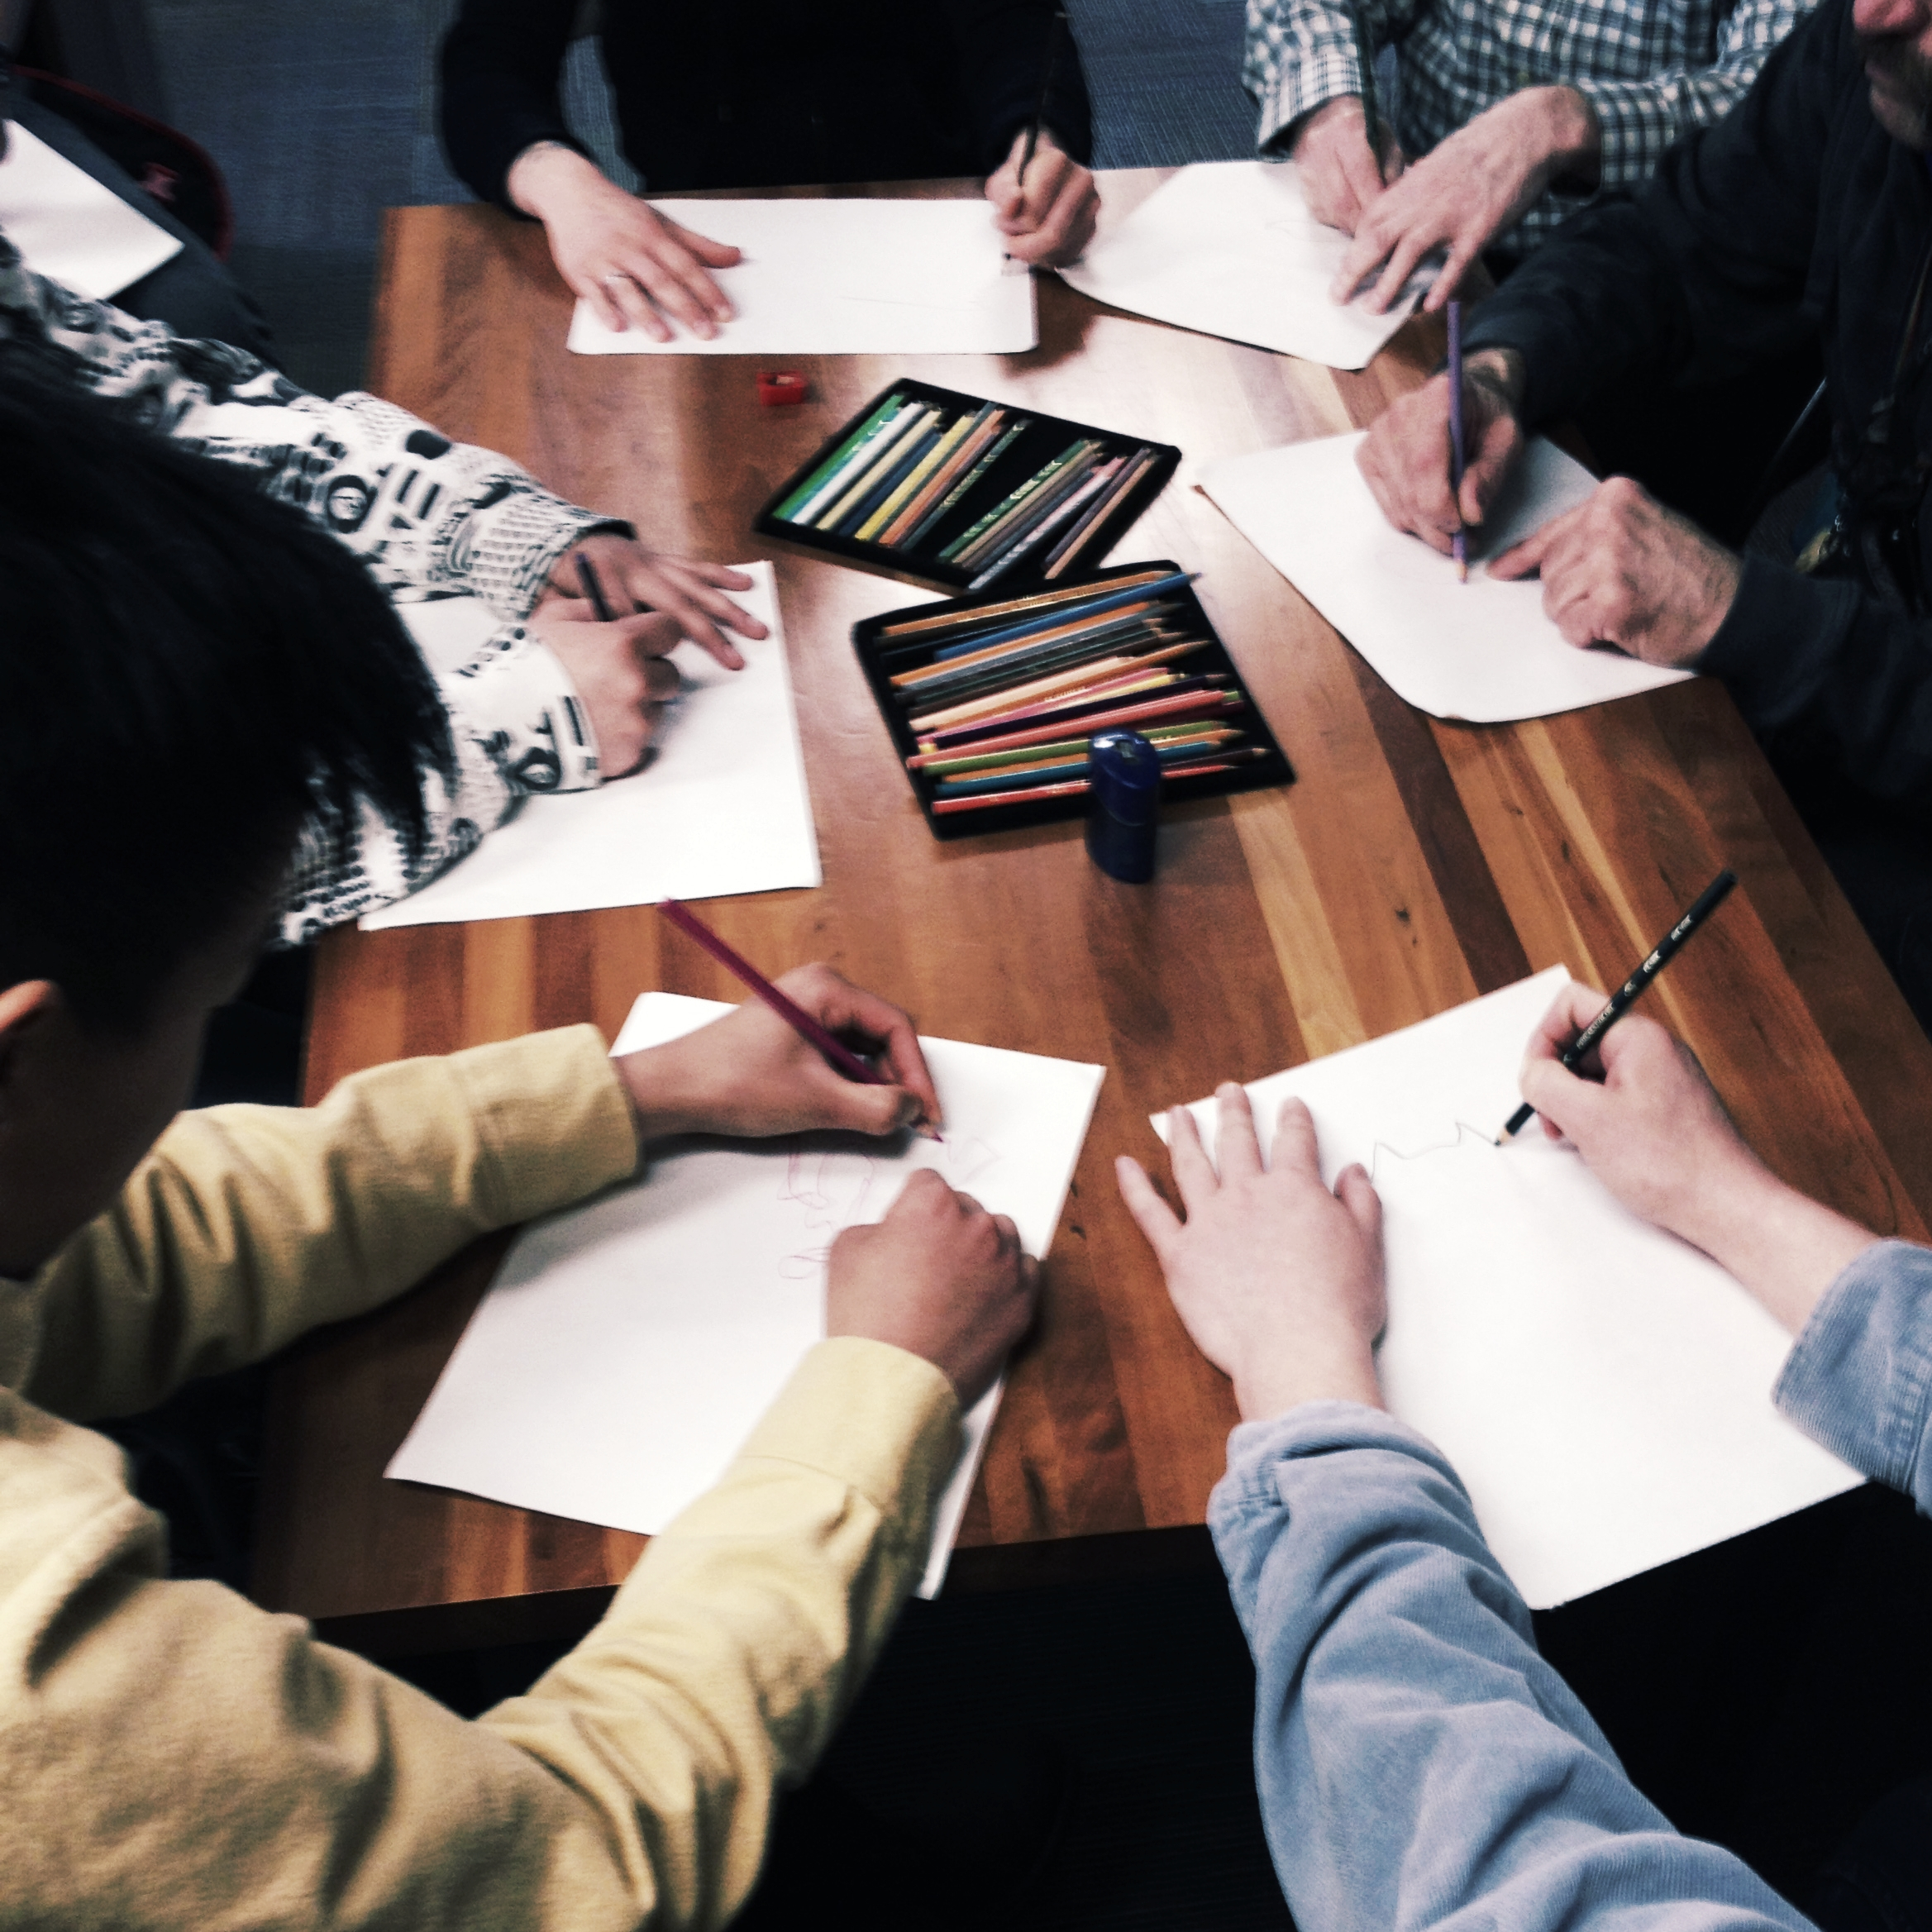 Group Artmaking